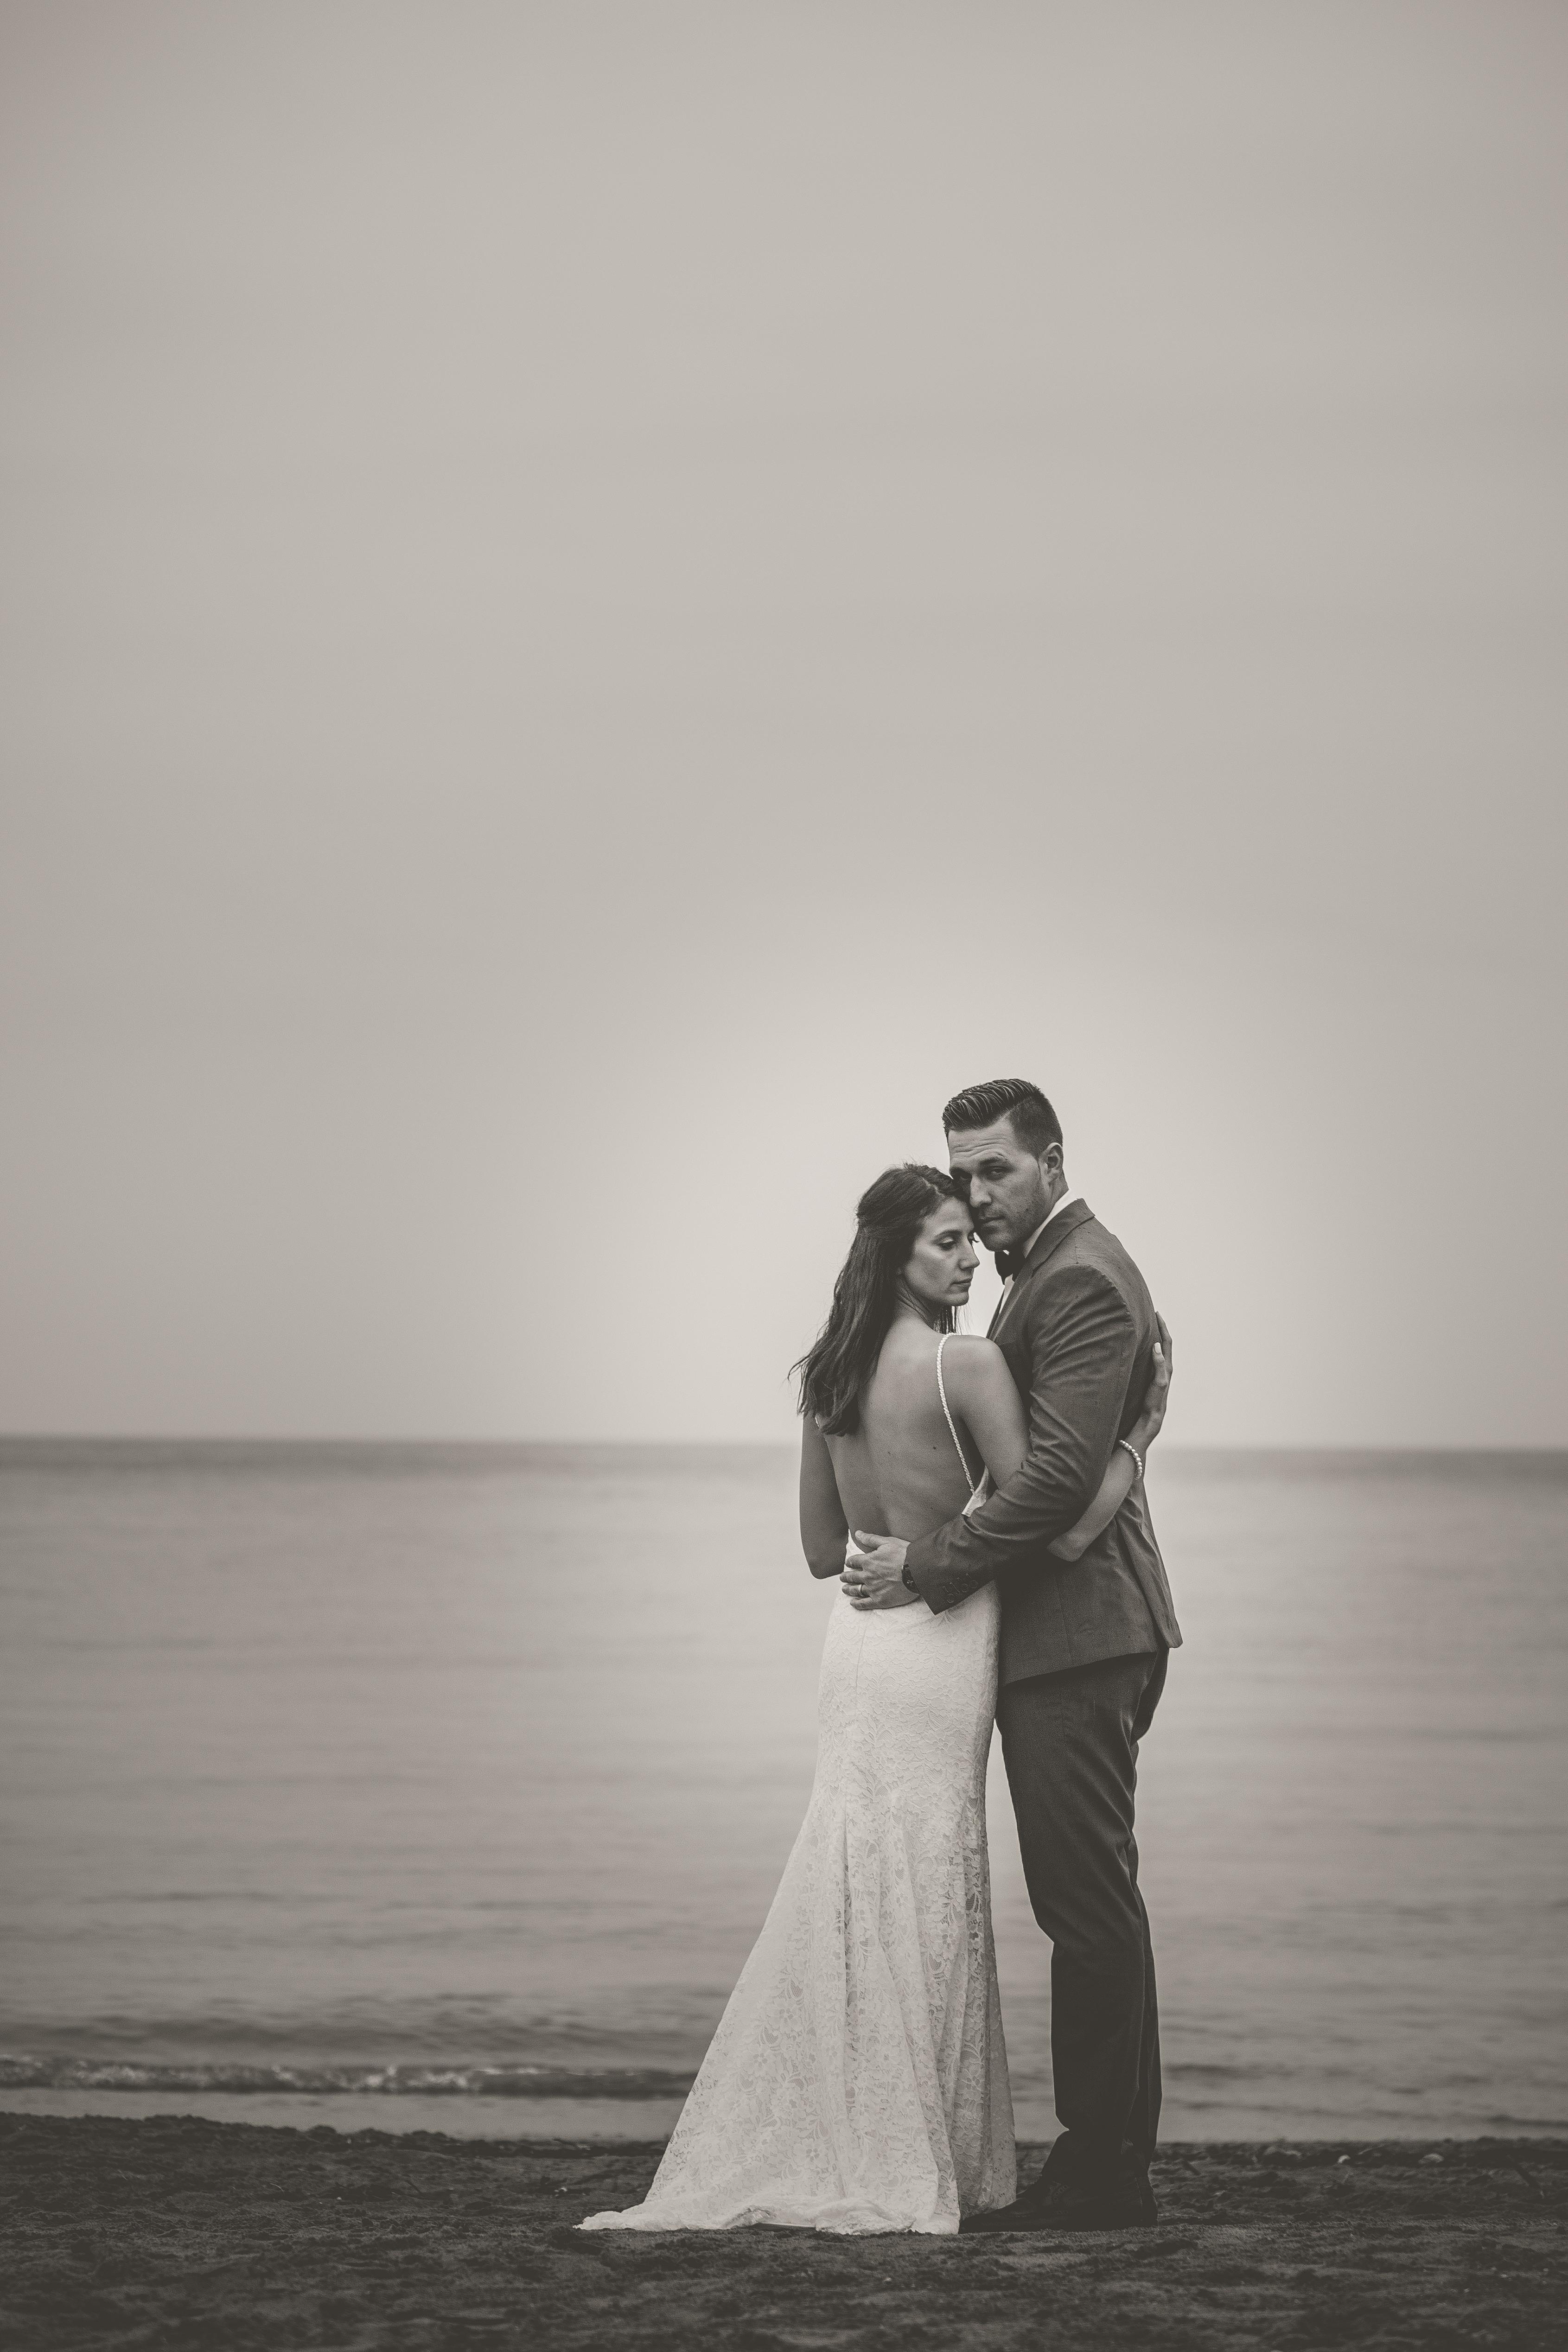 scarborough bluffs wedding photos 57 - Scarborough Bluffs Wedding Photos